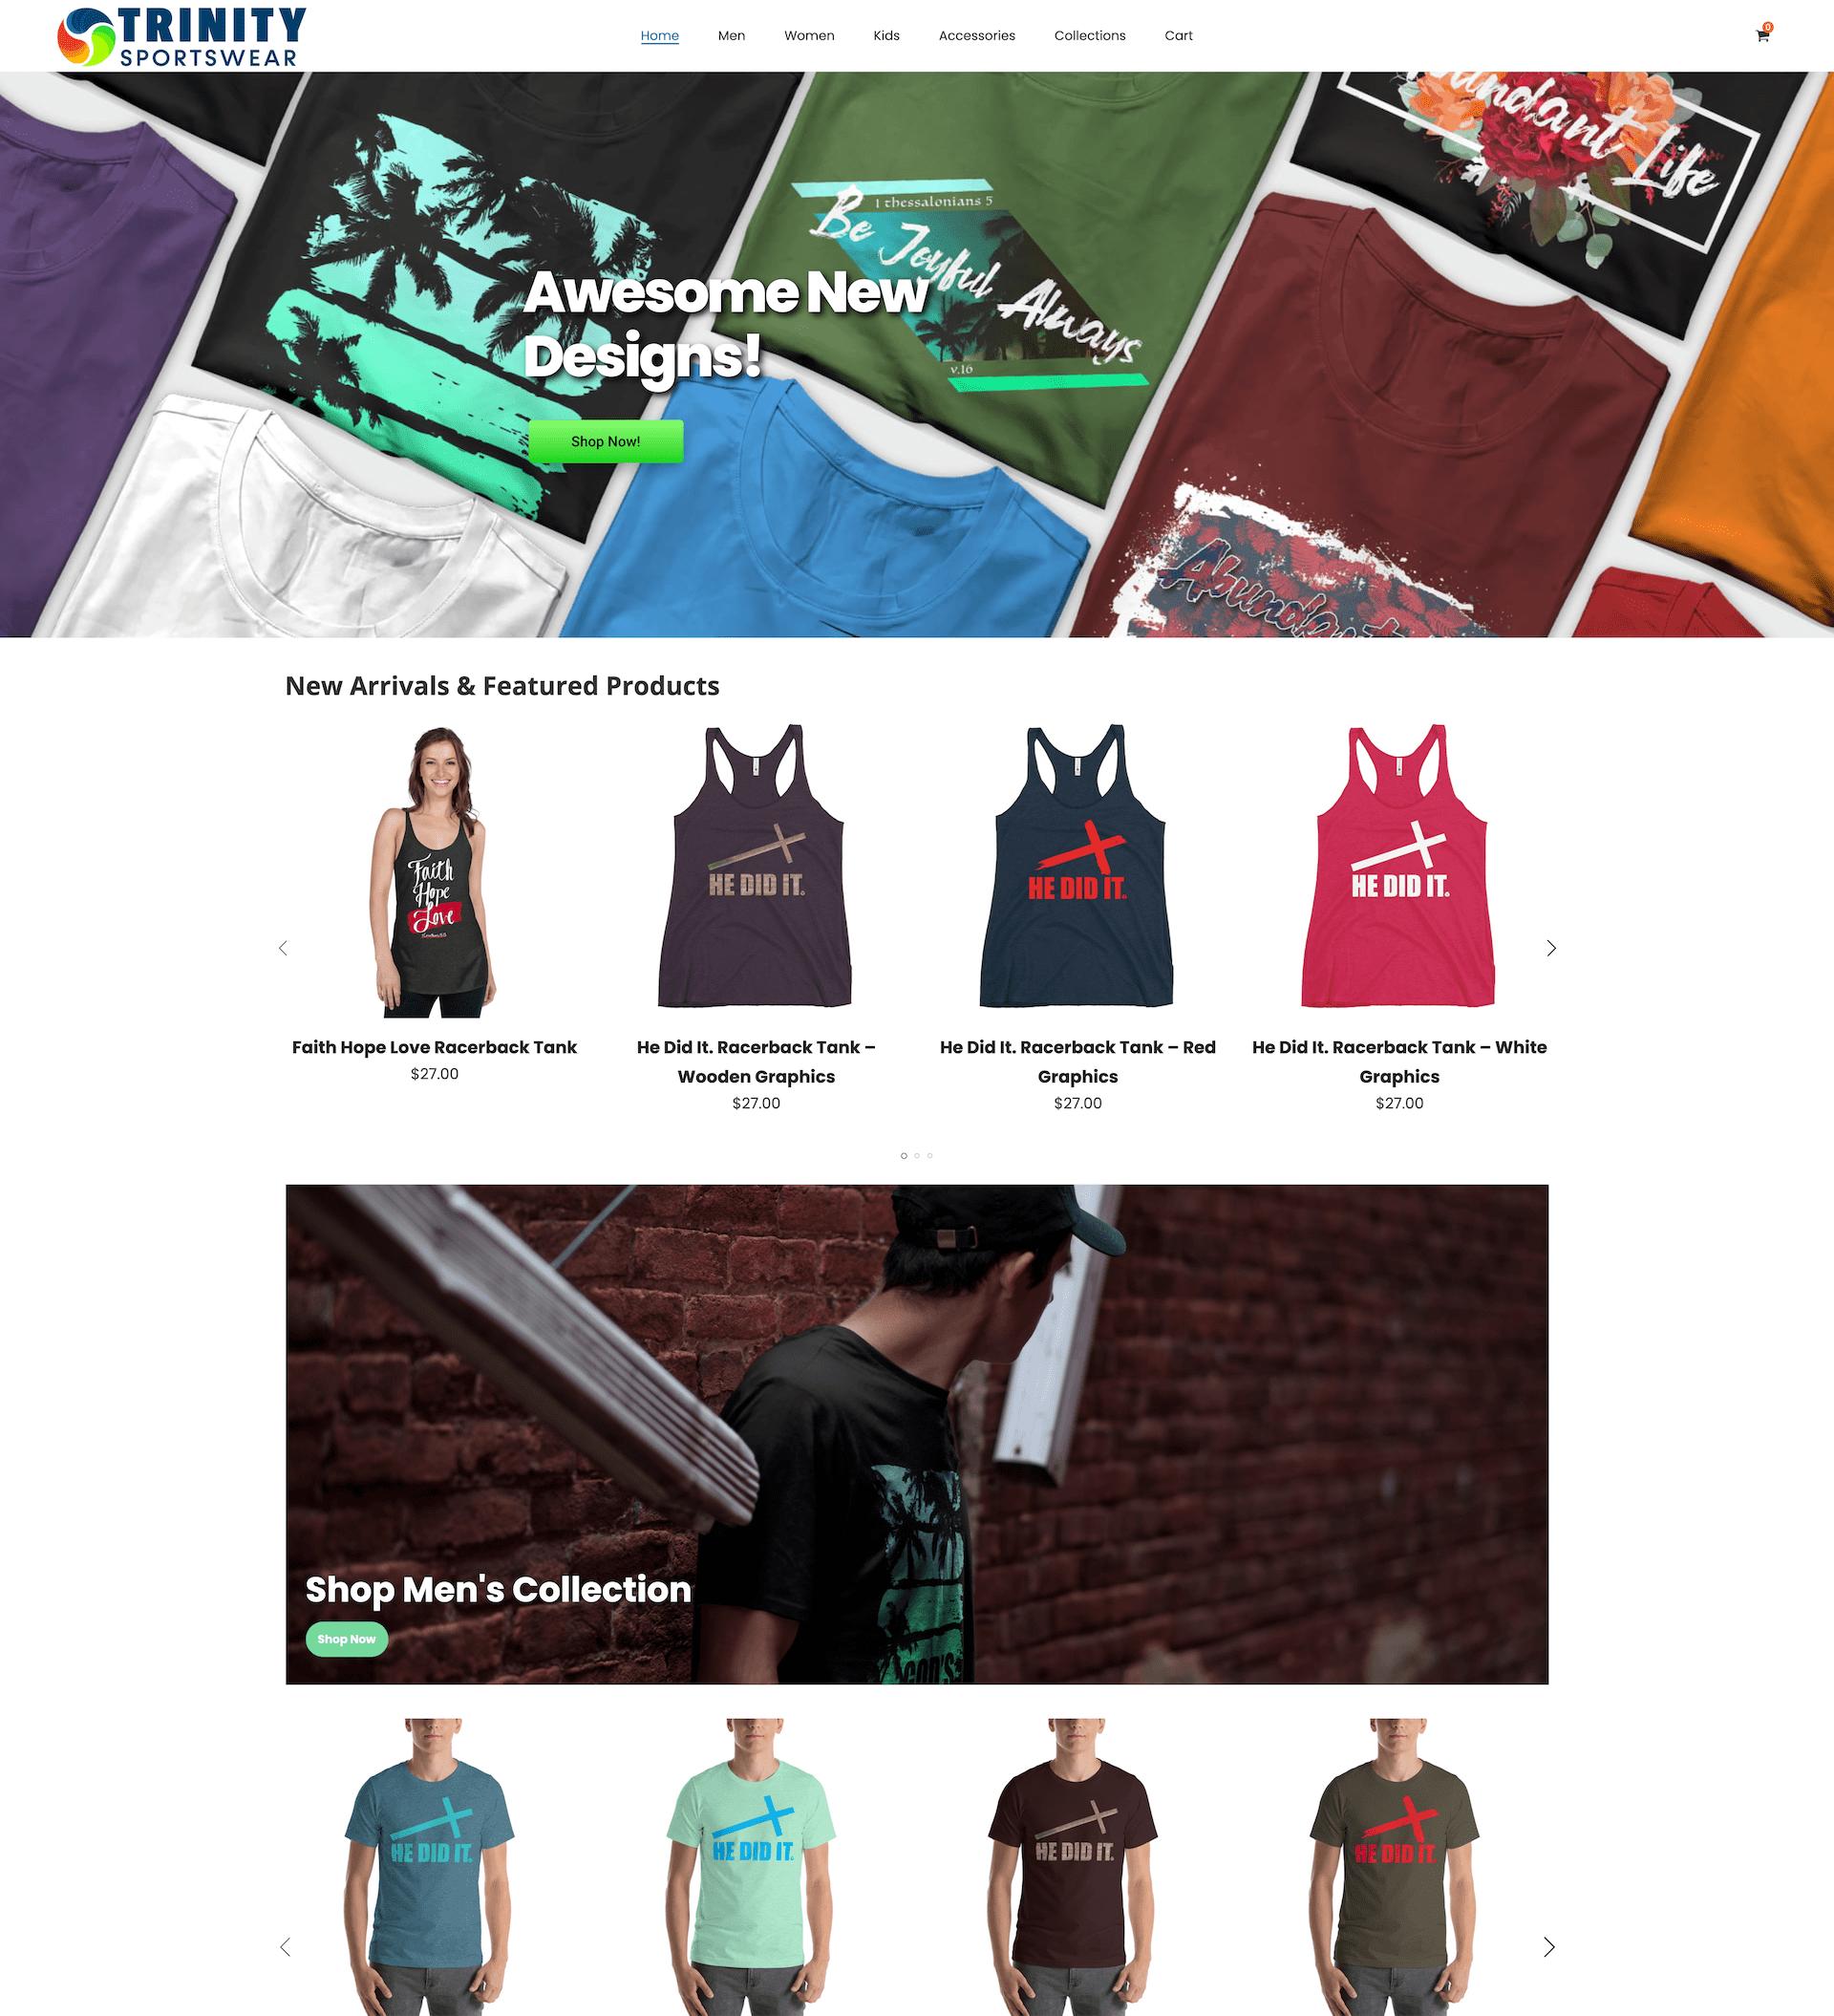 trinitysportswear.com website thumbnail preview - Click to navigate to trinitysportswear.com